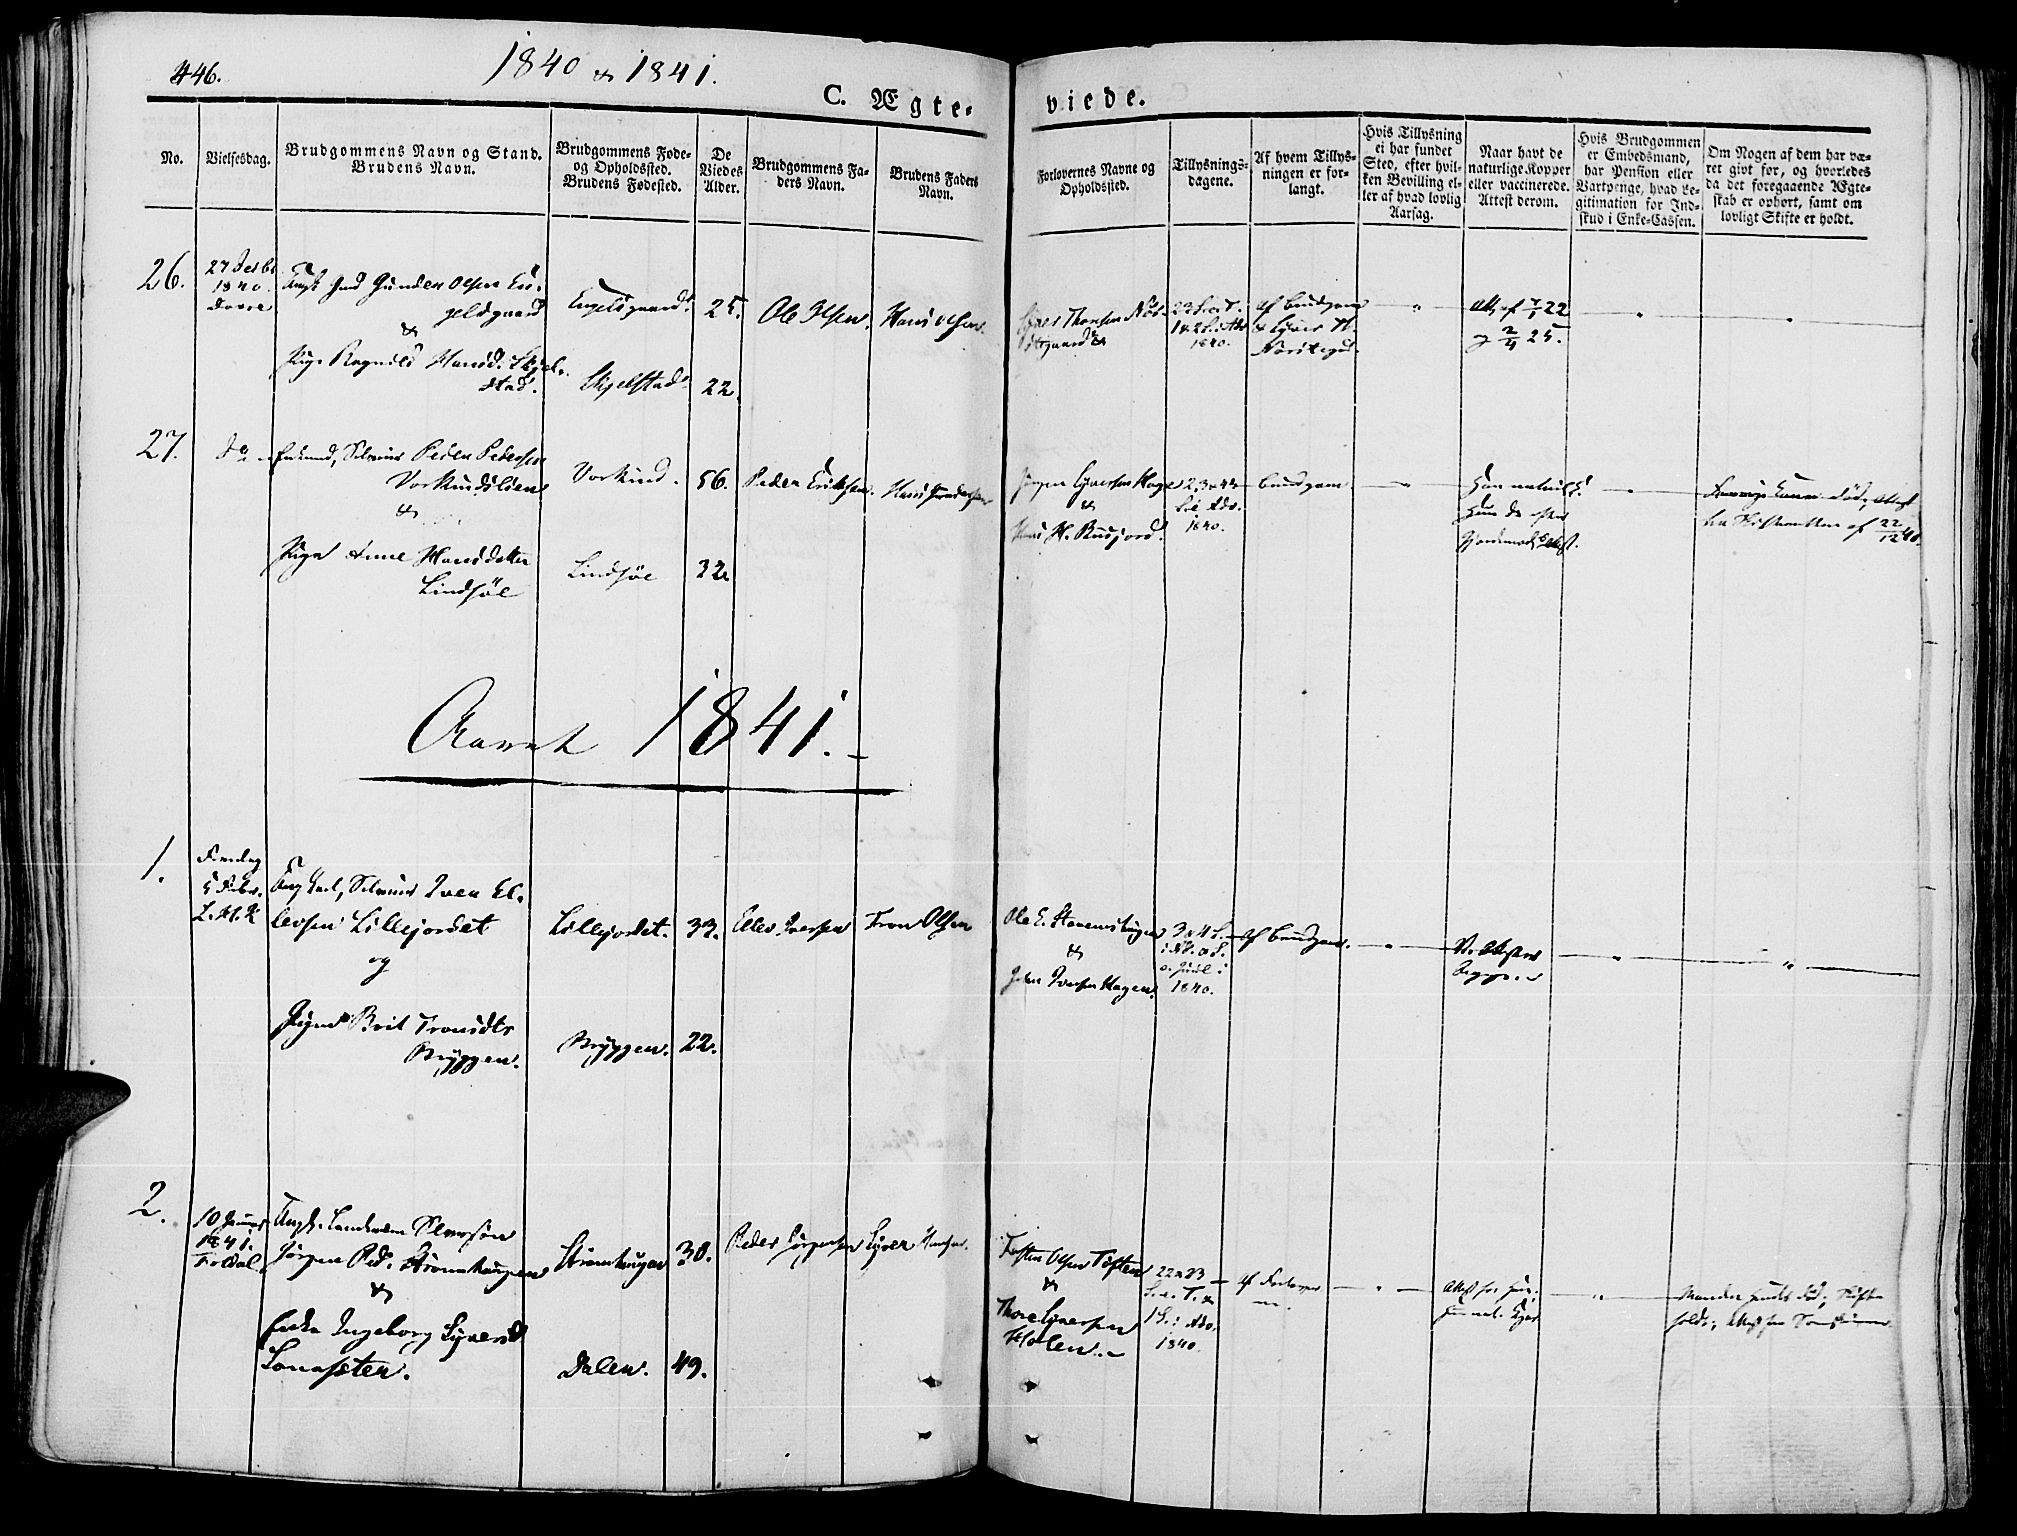 SAH, Lesja prestekontor, Ministerialbok nr. 5, 1830-1842, s. 446